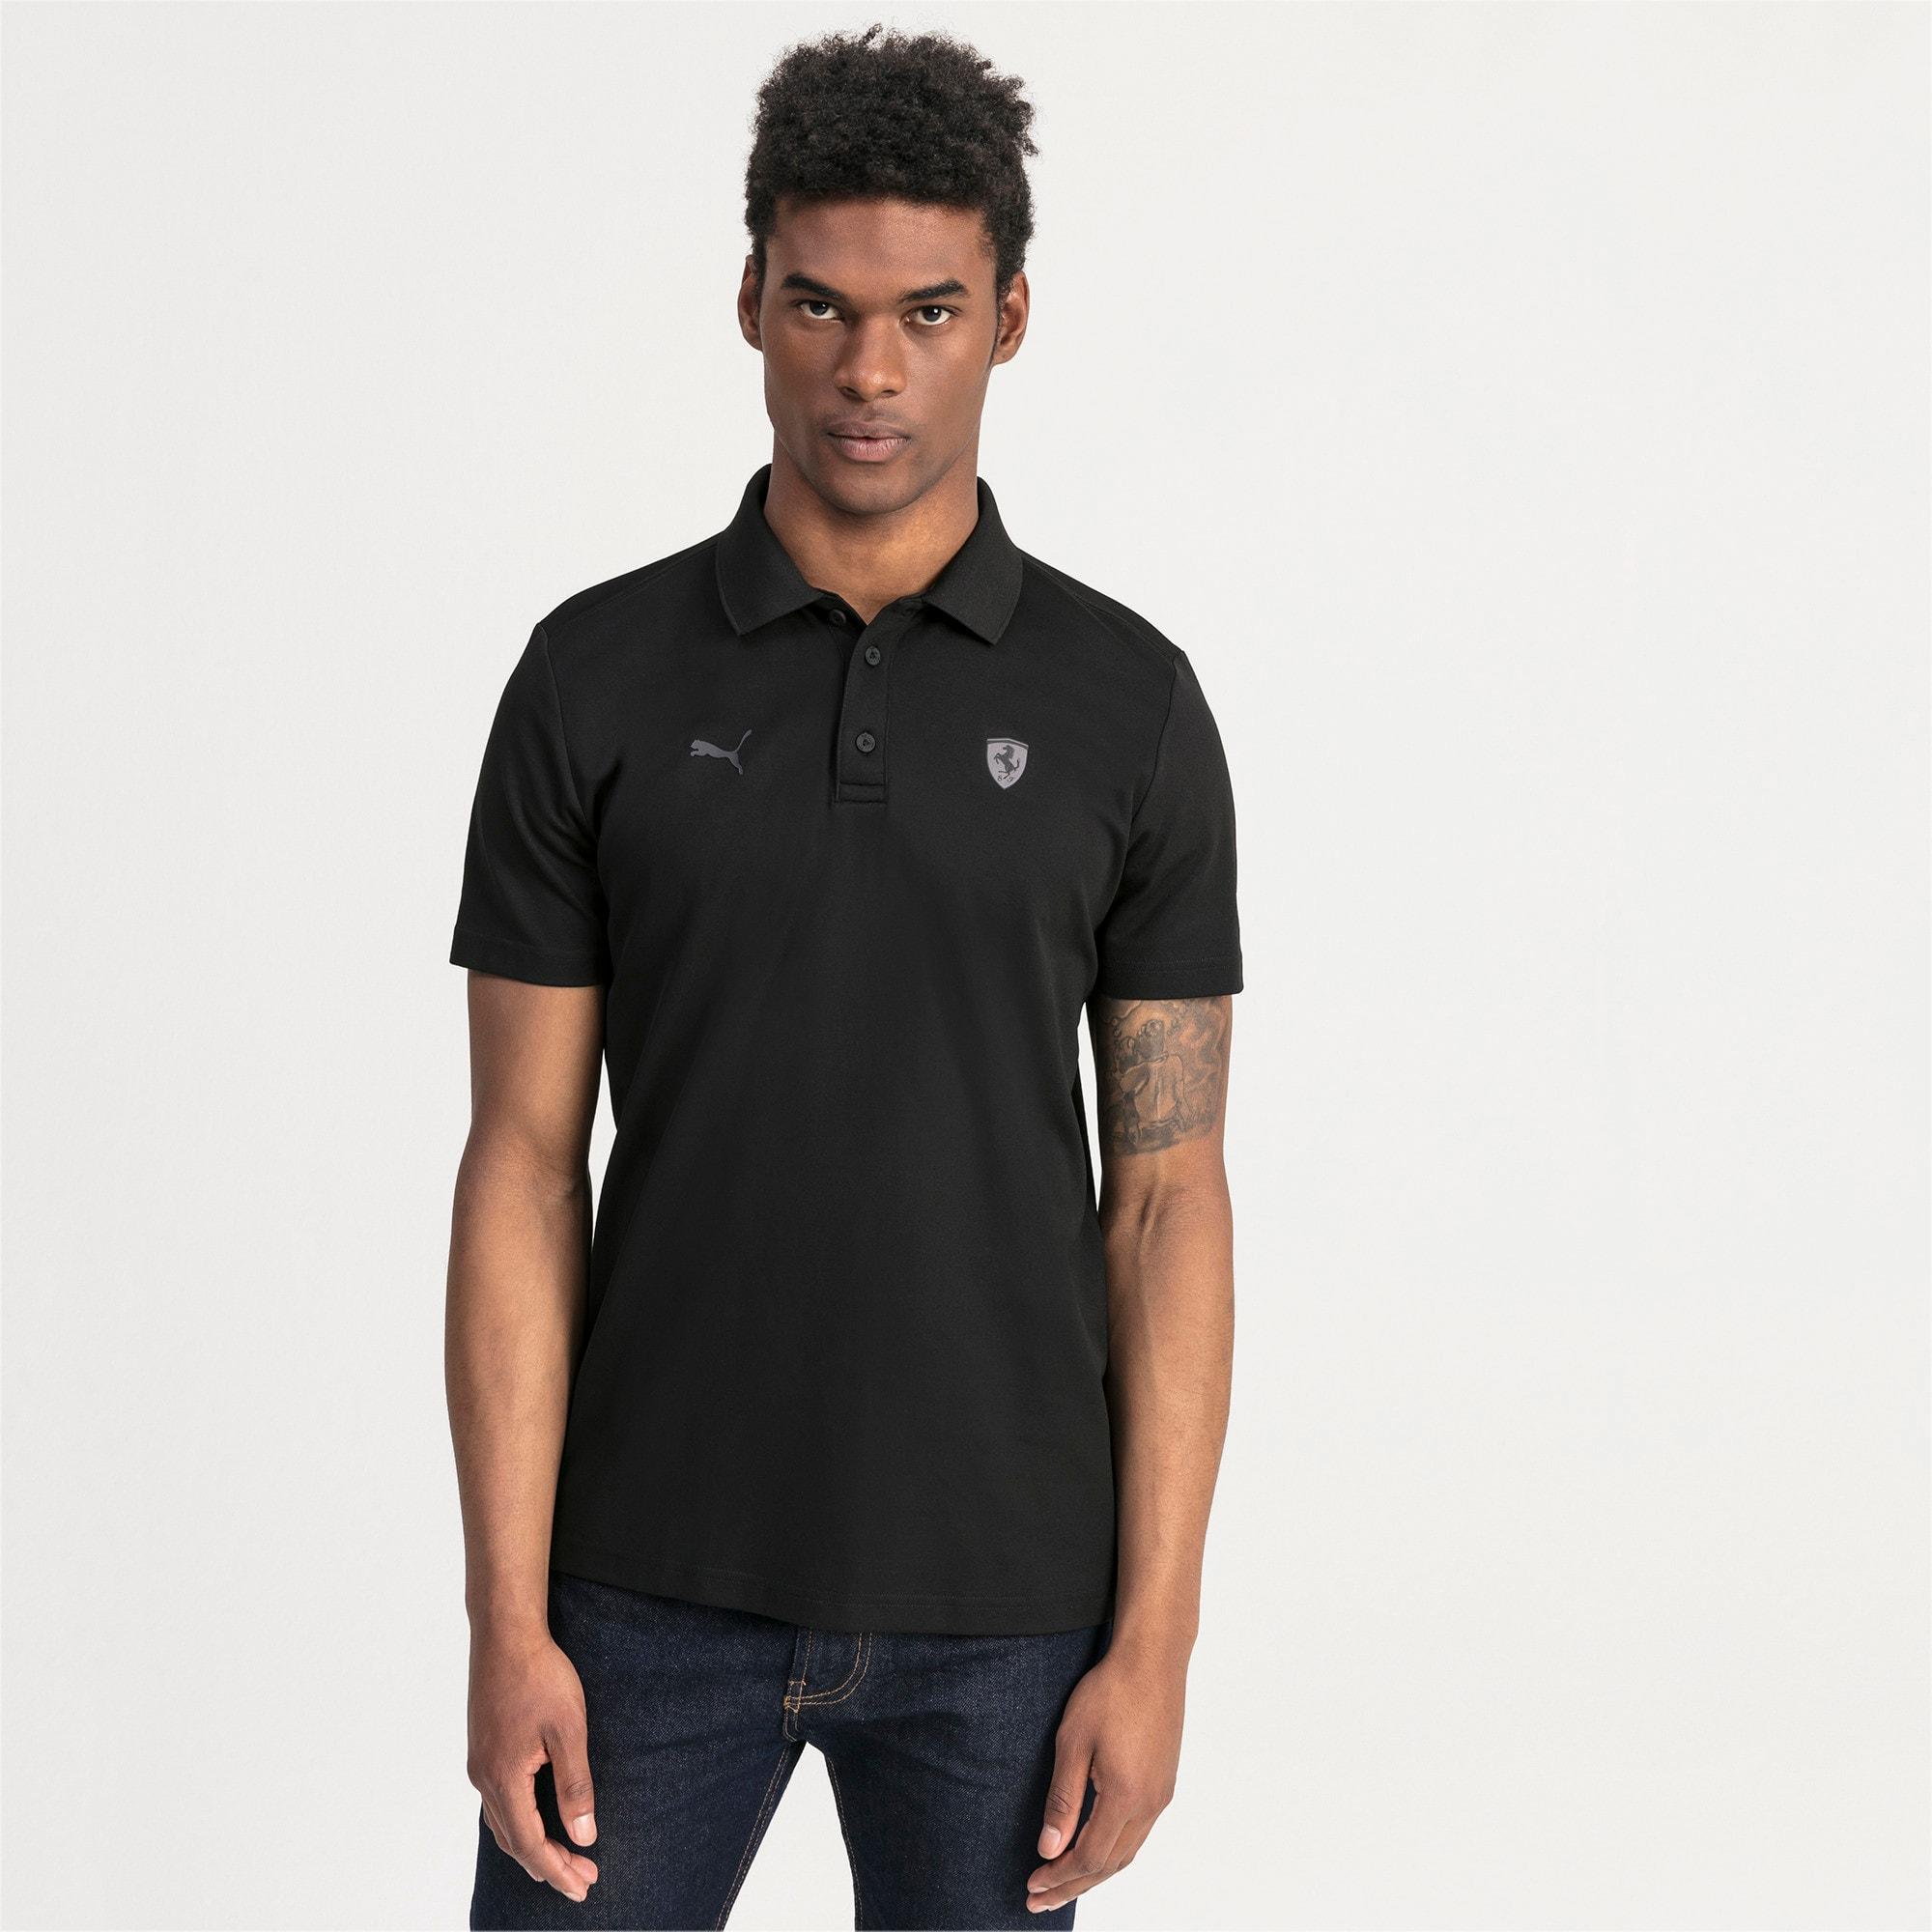 Thumbnail 1 of Ferrari Men's Polo Shirt, Puma Black, medium